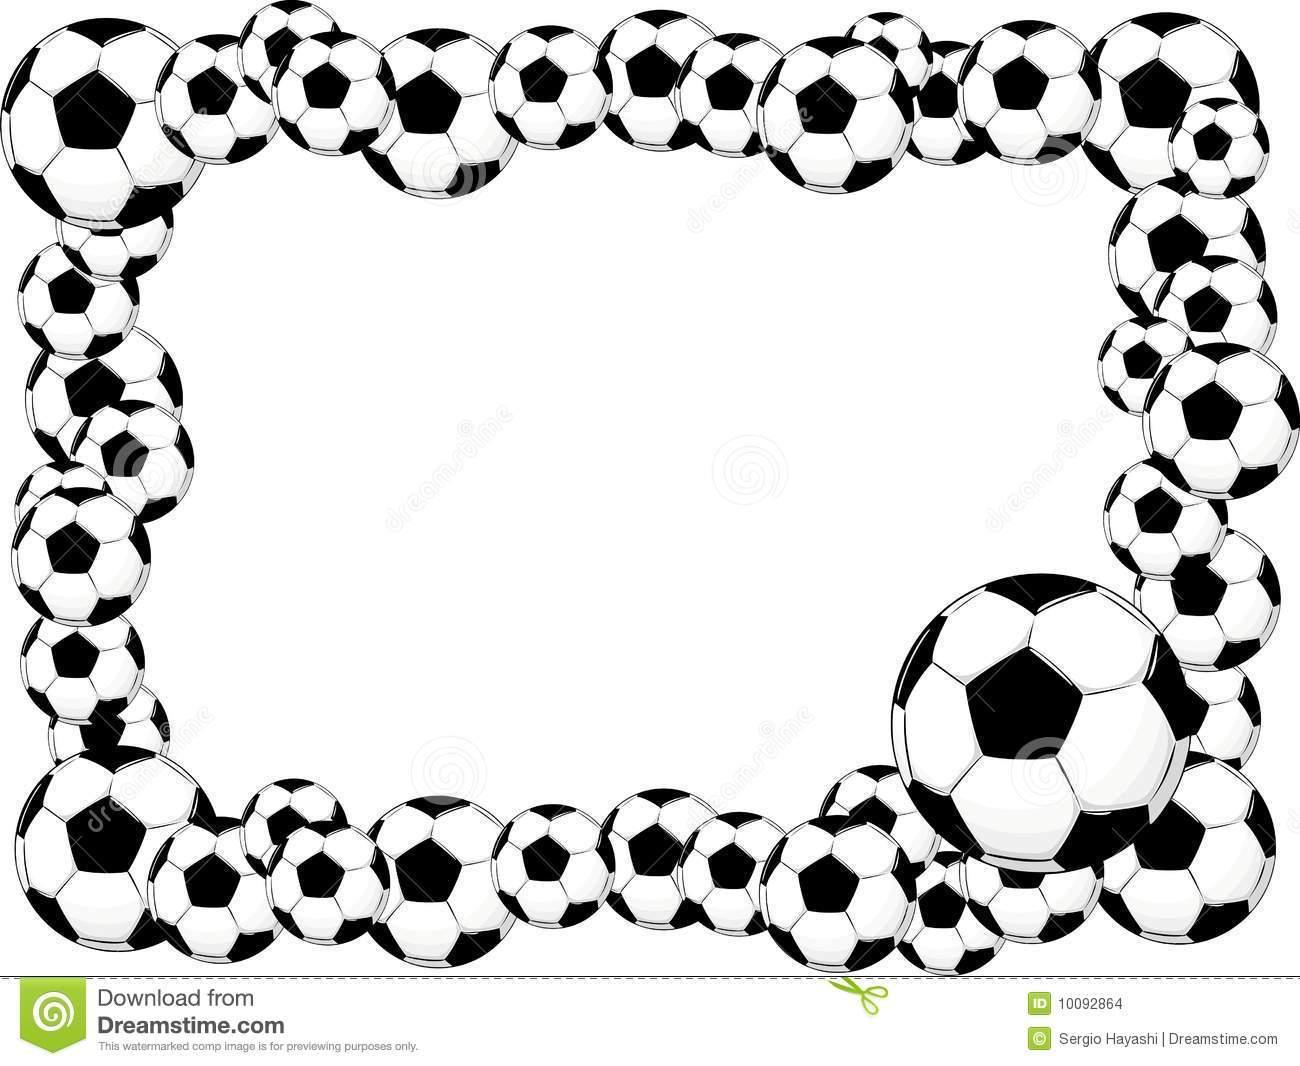 Soccer clipart border » Clipart Portal.